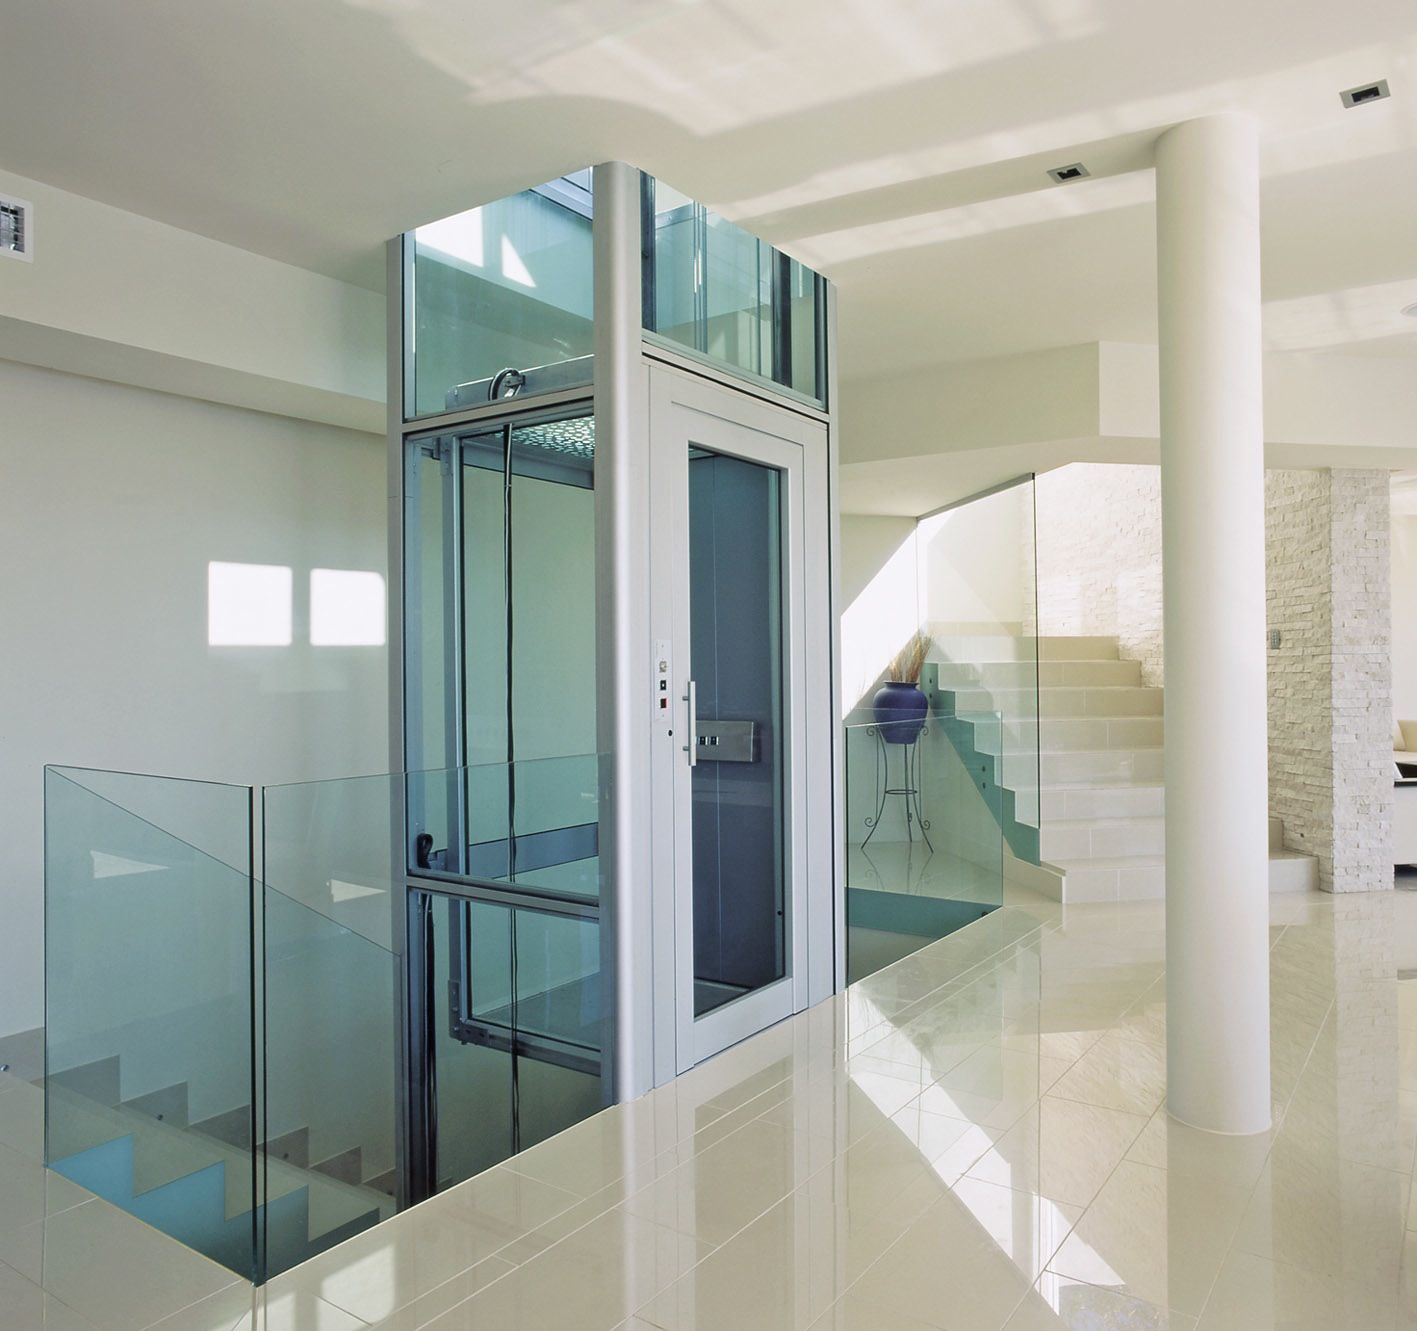 Hydraulic Lift in Mumbai. hydraulic lift. Hydraulic elevators. hydraulic lifts in Pune.